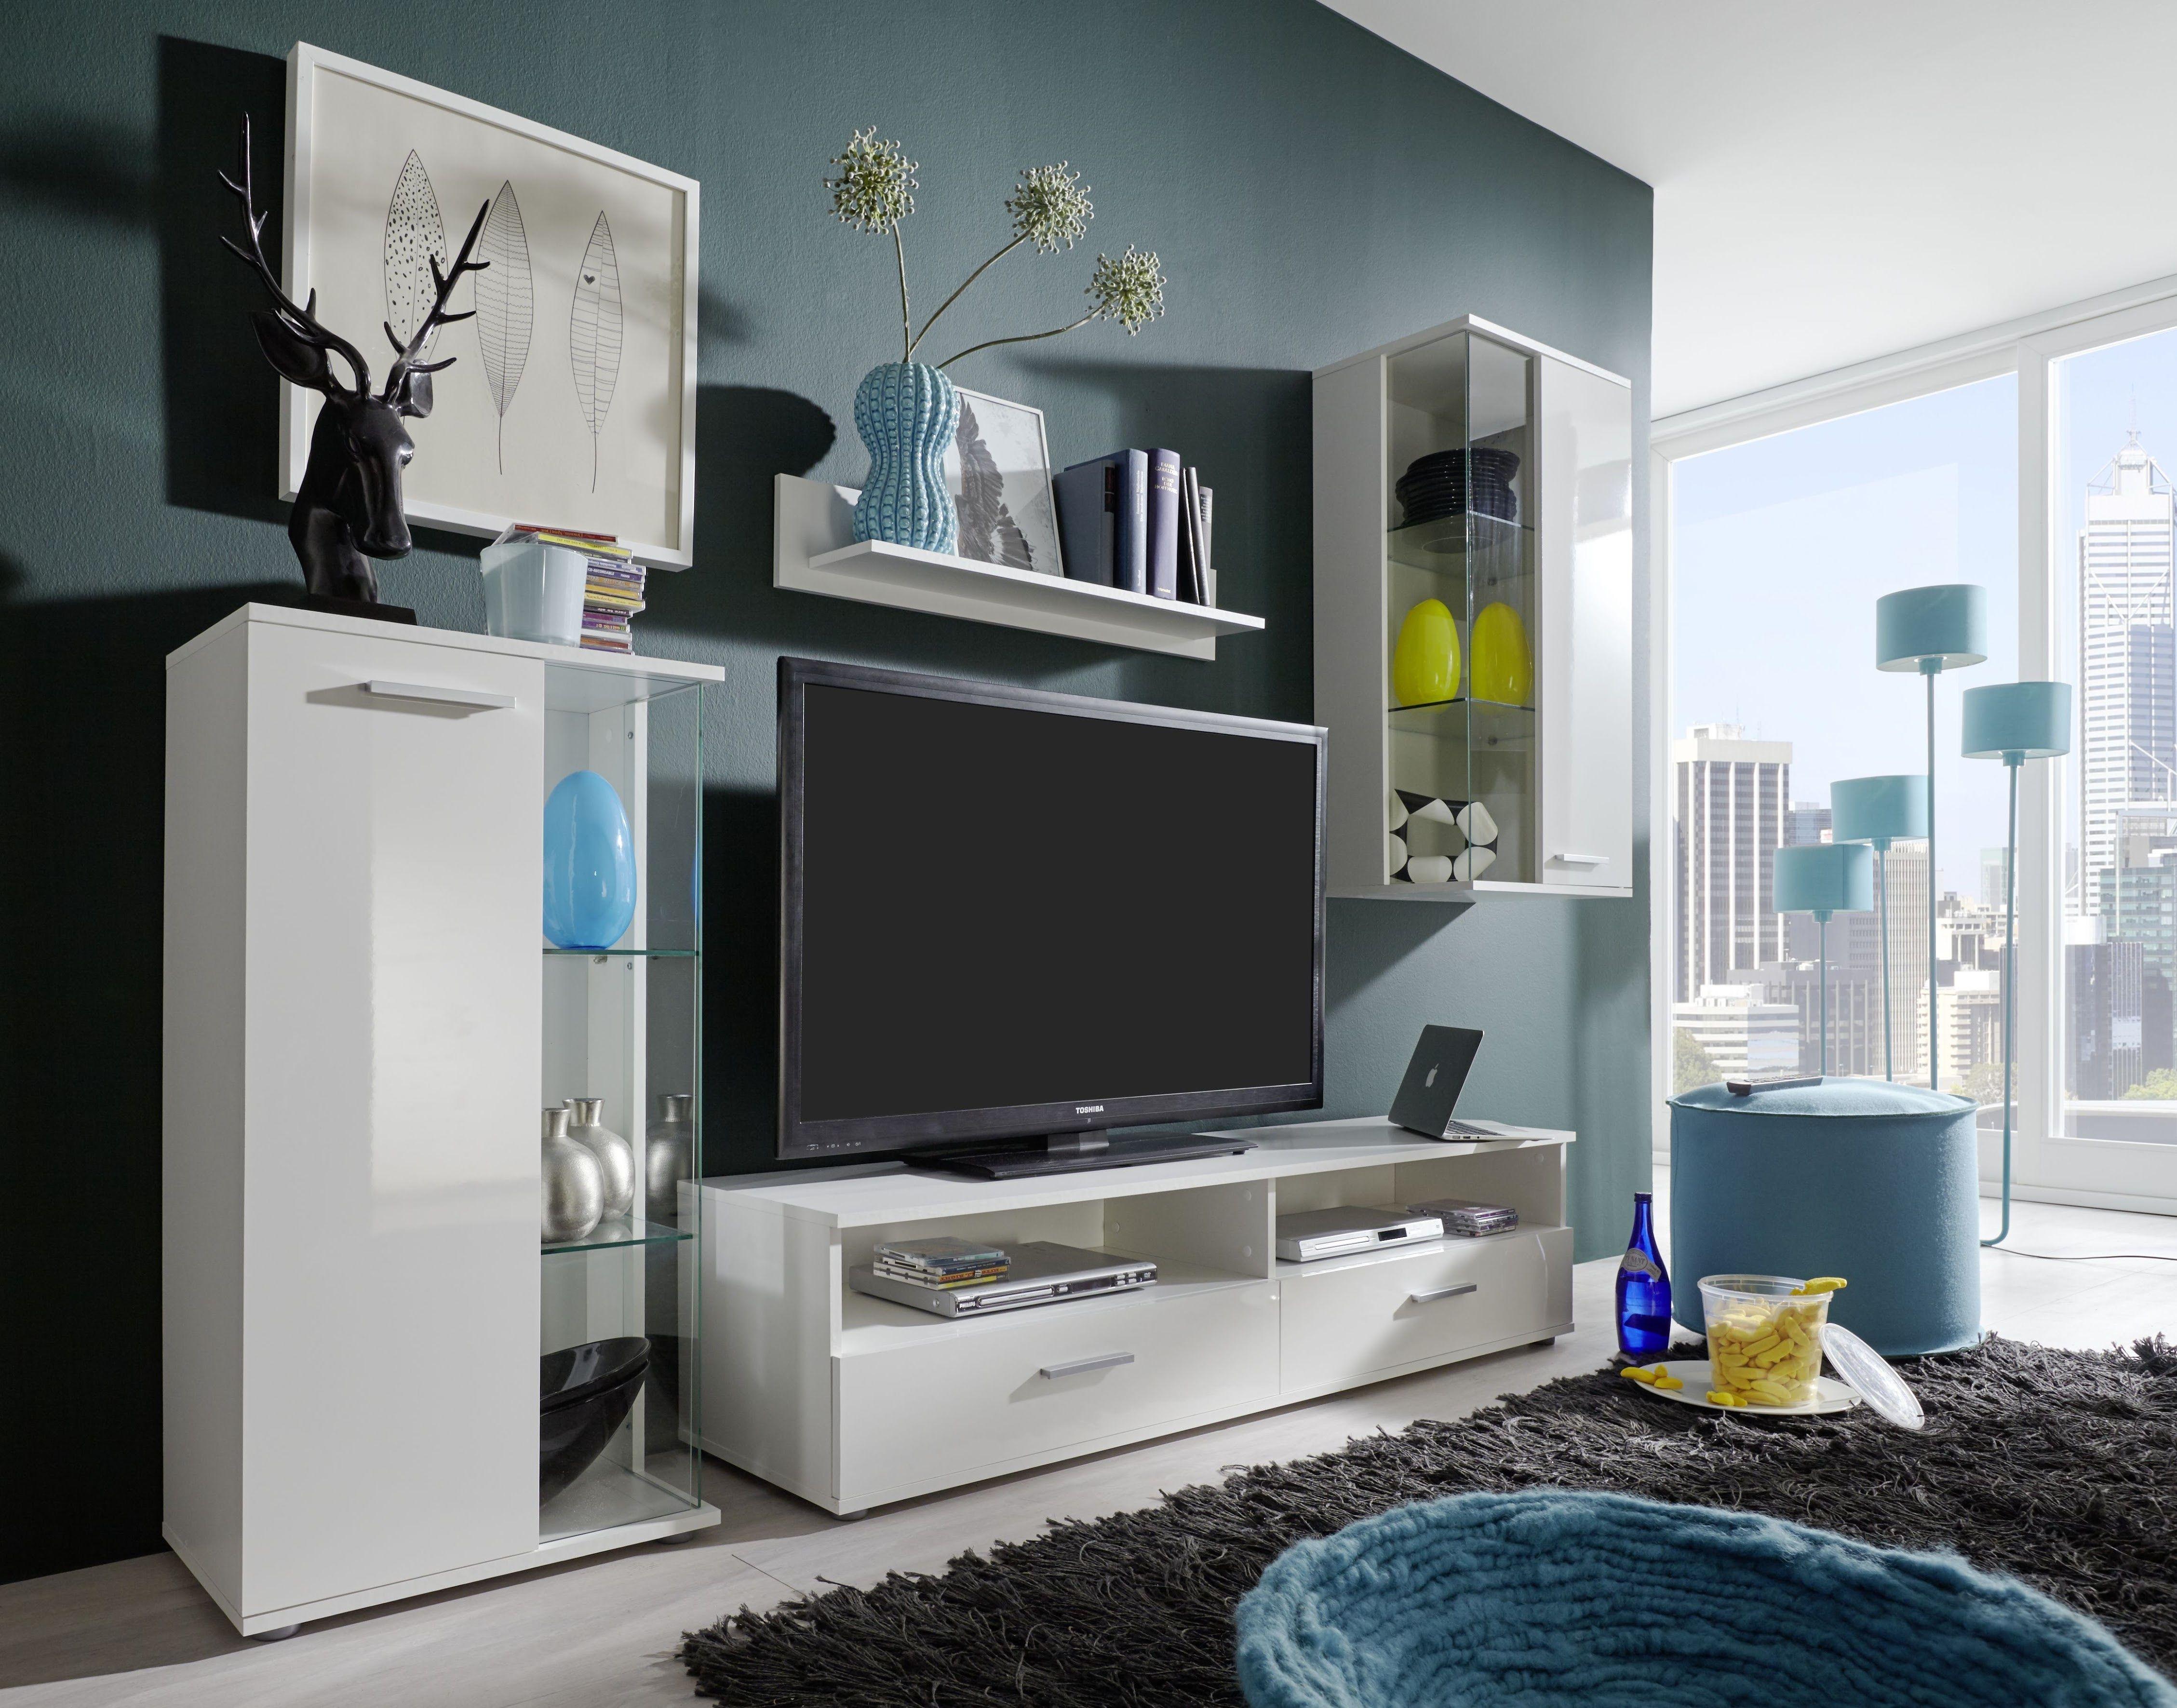 wohnwand weiss glanz weiss melamin woody 93 00919 holz modern jetzt bestellen unter https. Black Bedroom Furniture Sets. Home Design Ideas